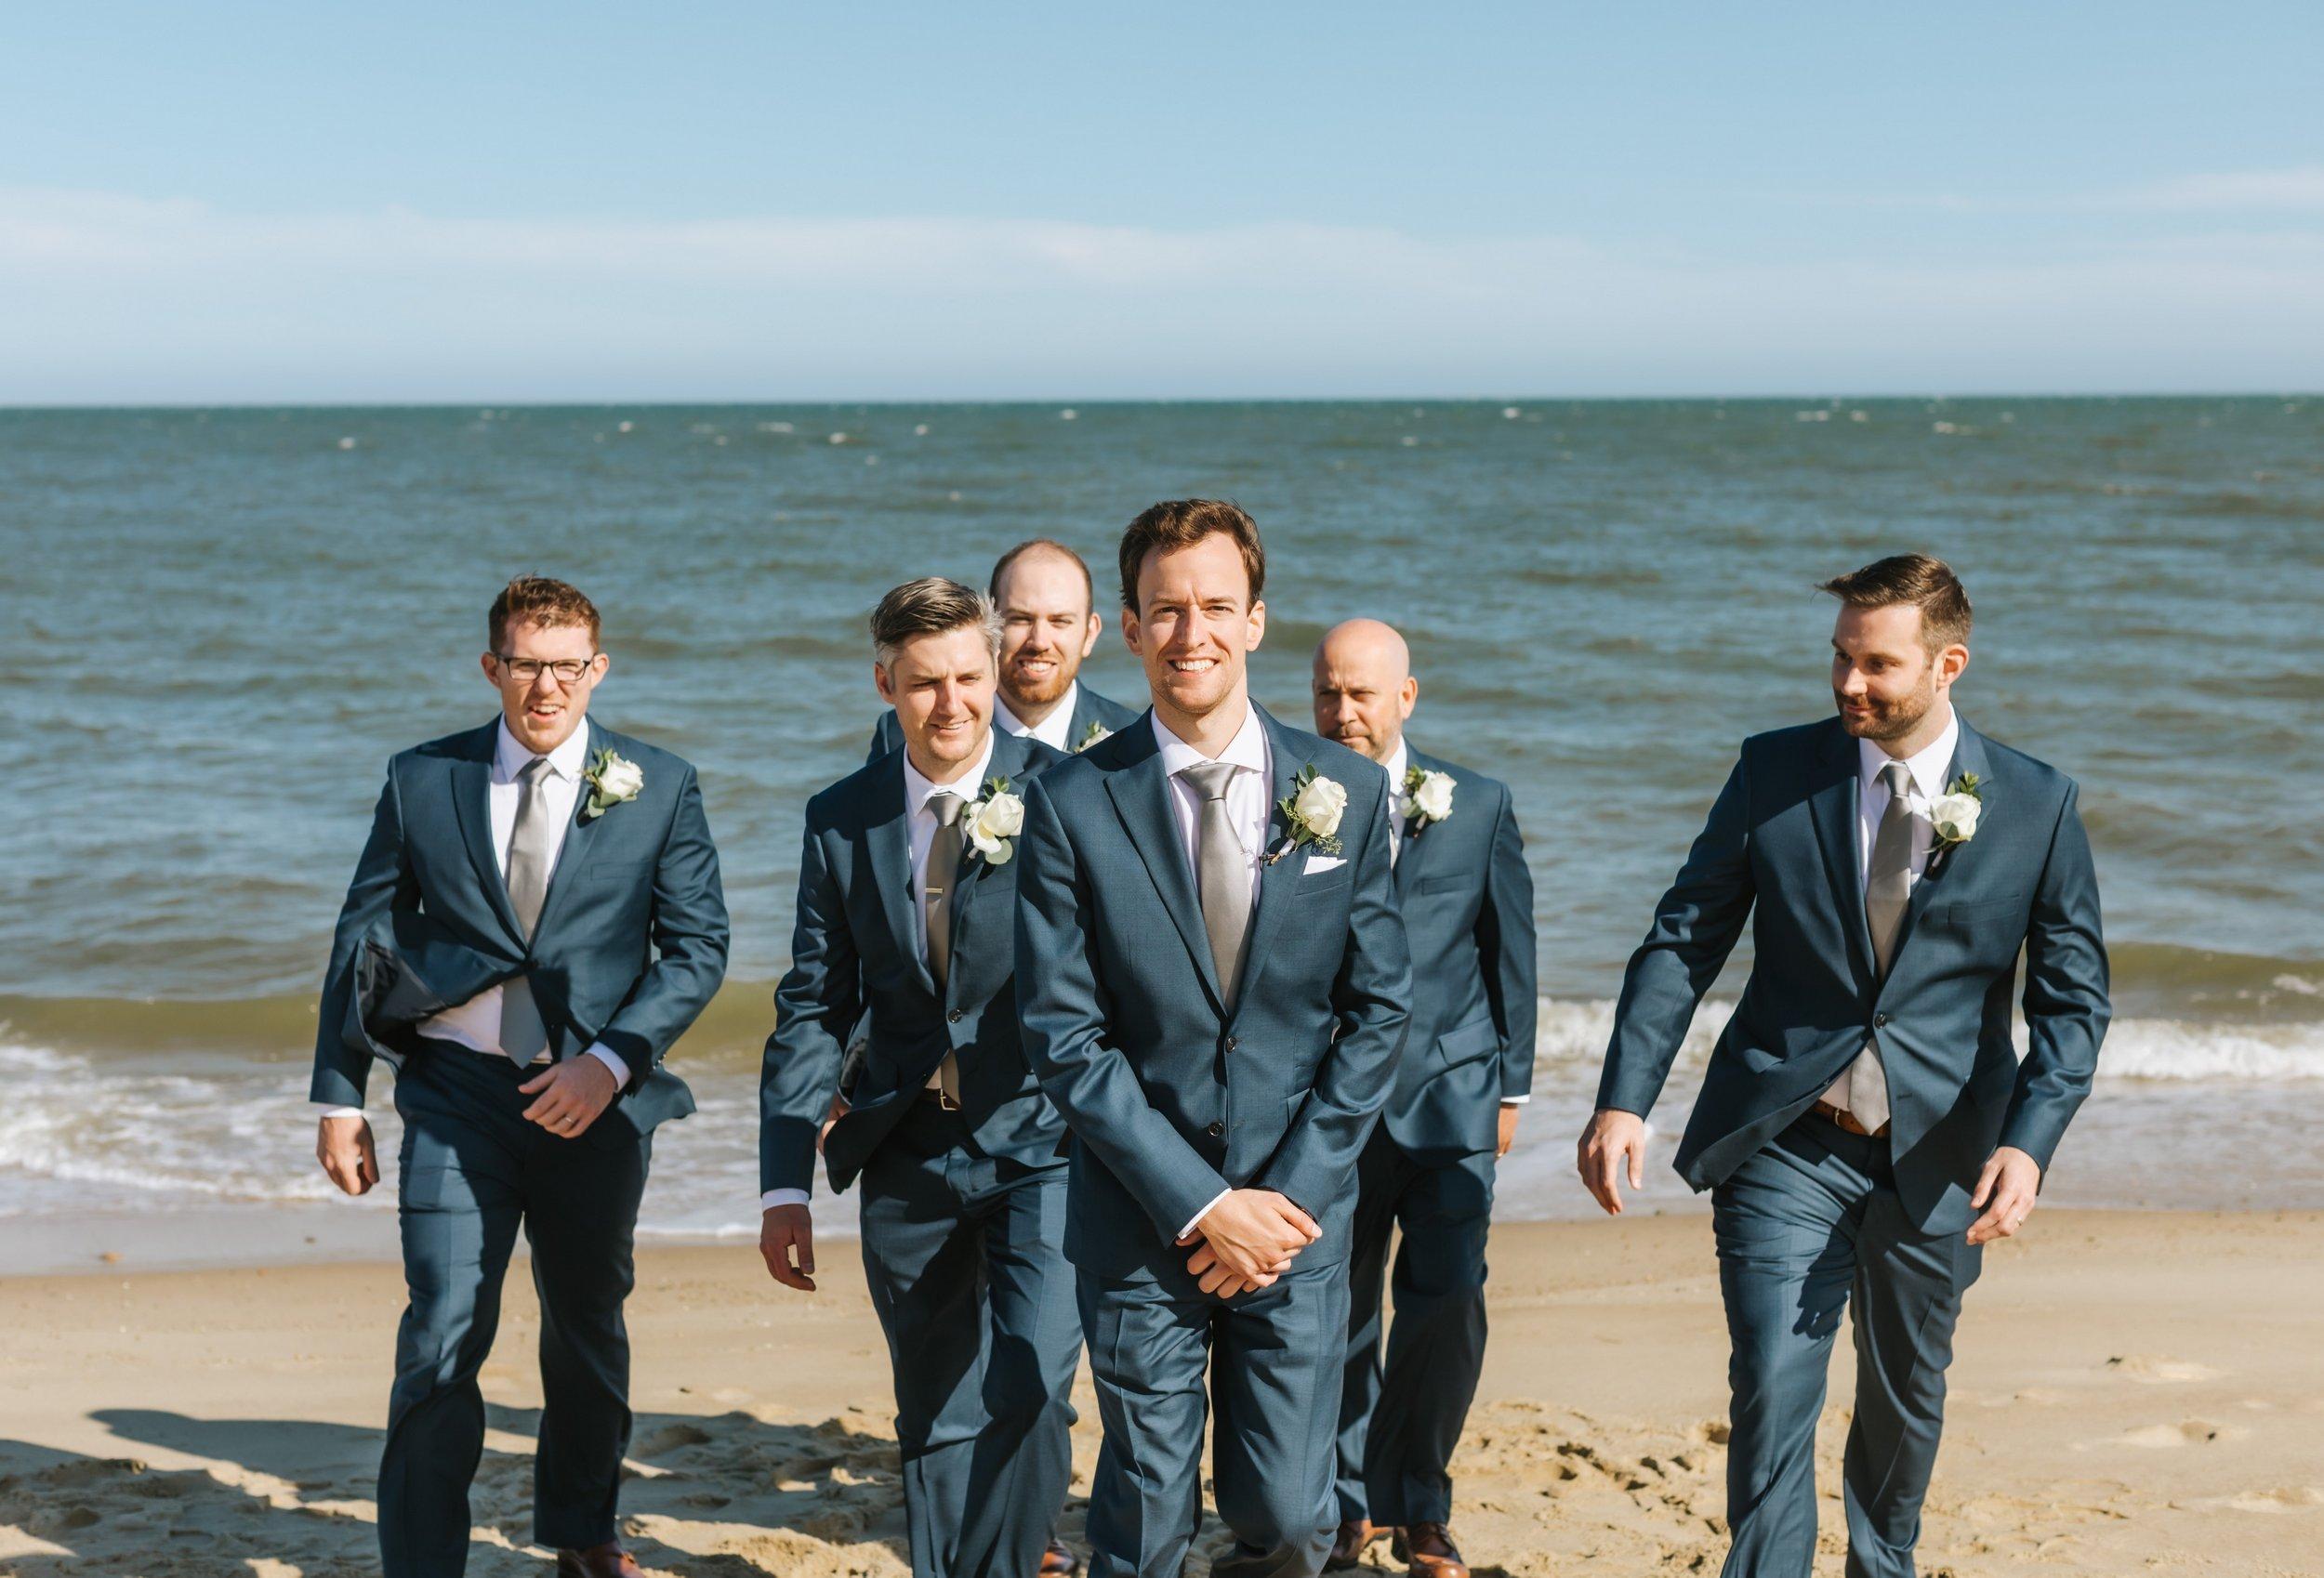 Popponesset-Inn-Wedding-Cape-Cod-Lena-Mirisola-Photography-24.jpg